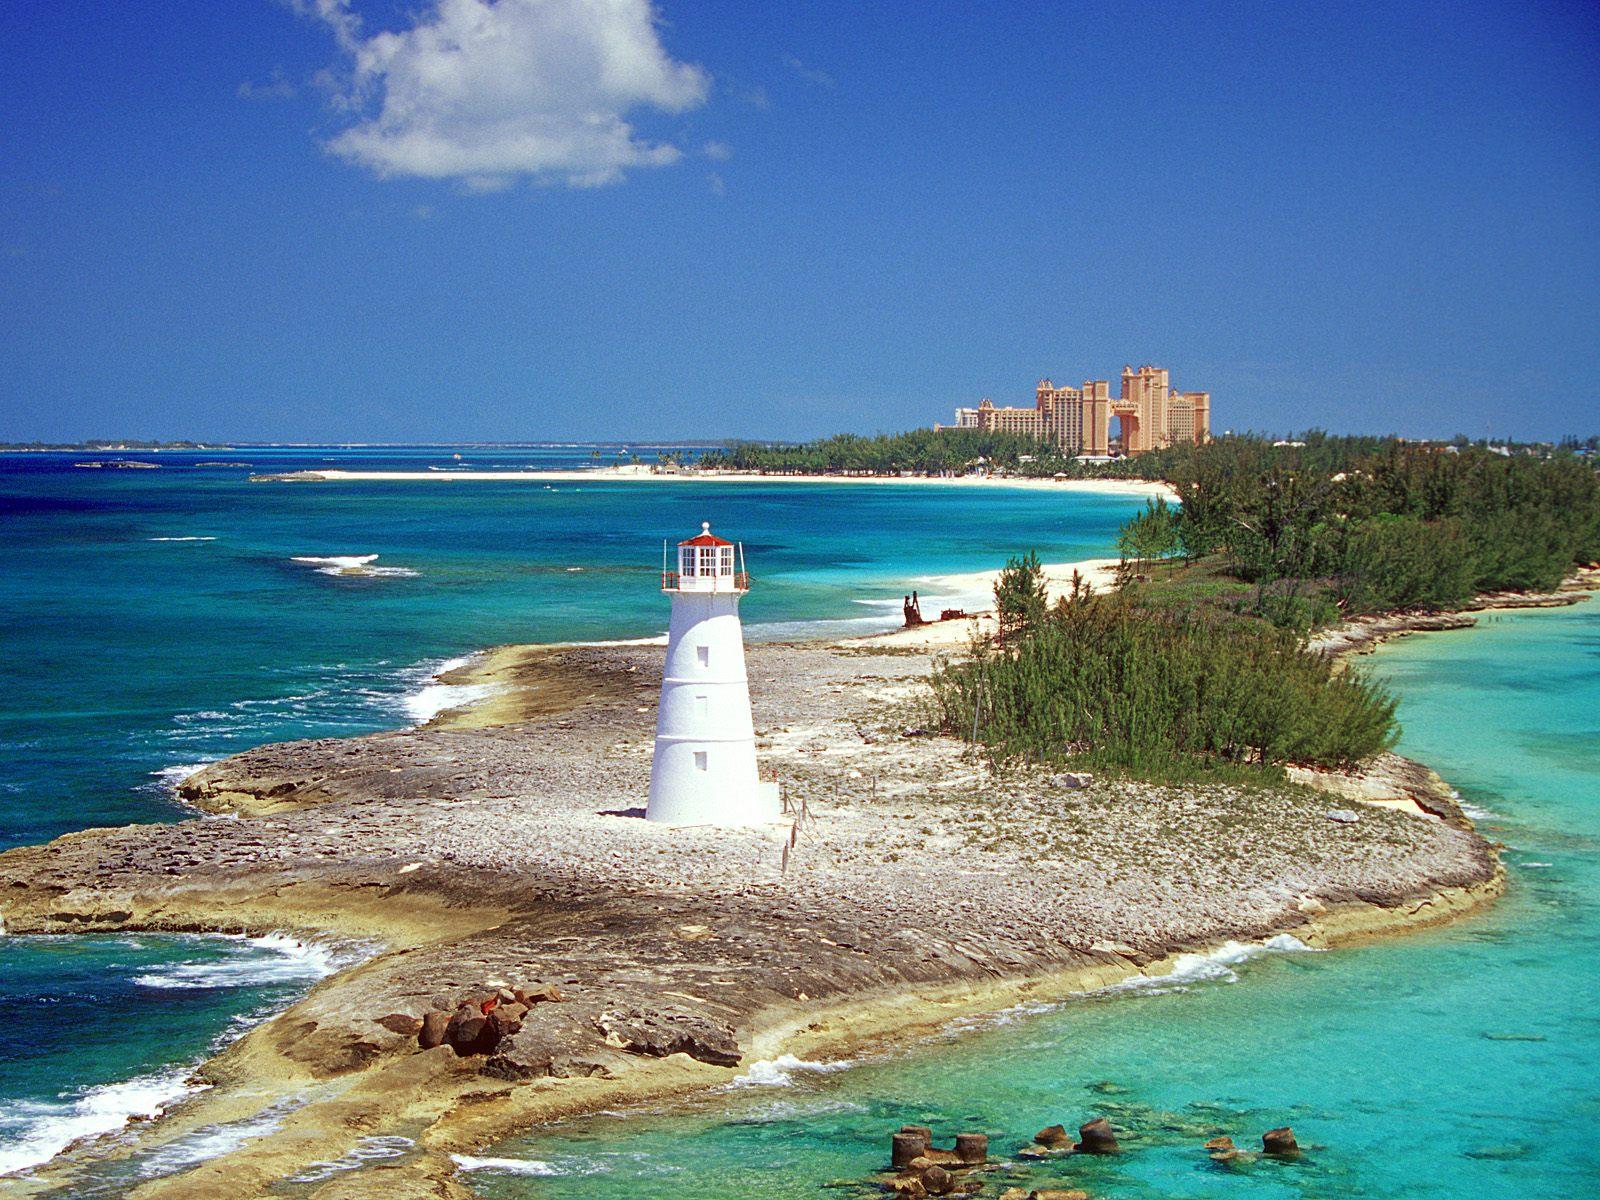 Paradise Island Nassau Bahamas Wallpapers HD Wallpapers 1600x1200